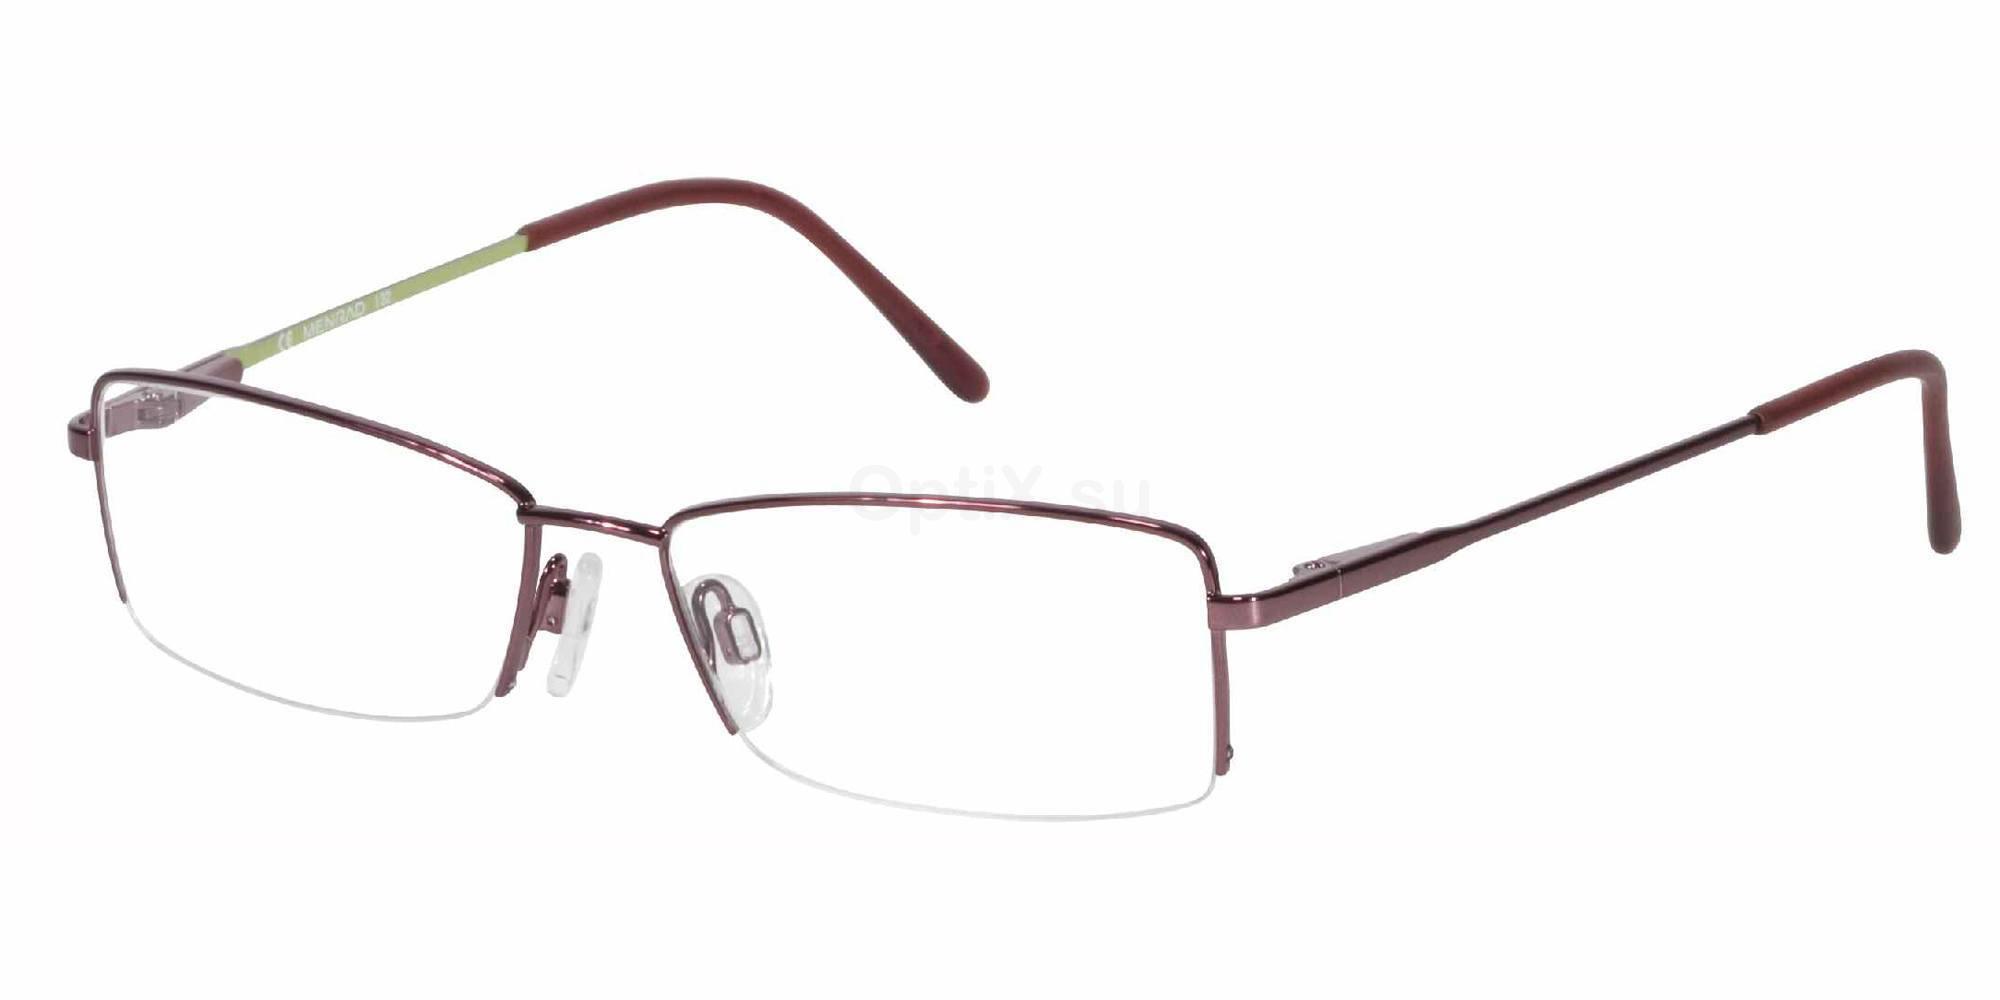 1425 13909 , MENRAD Eyewear